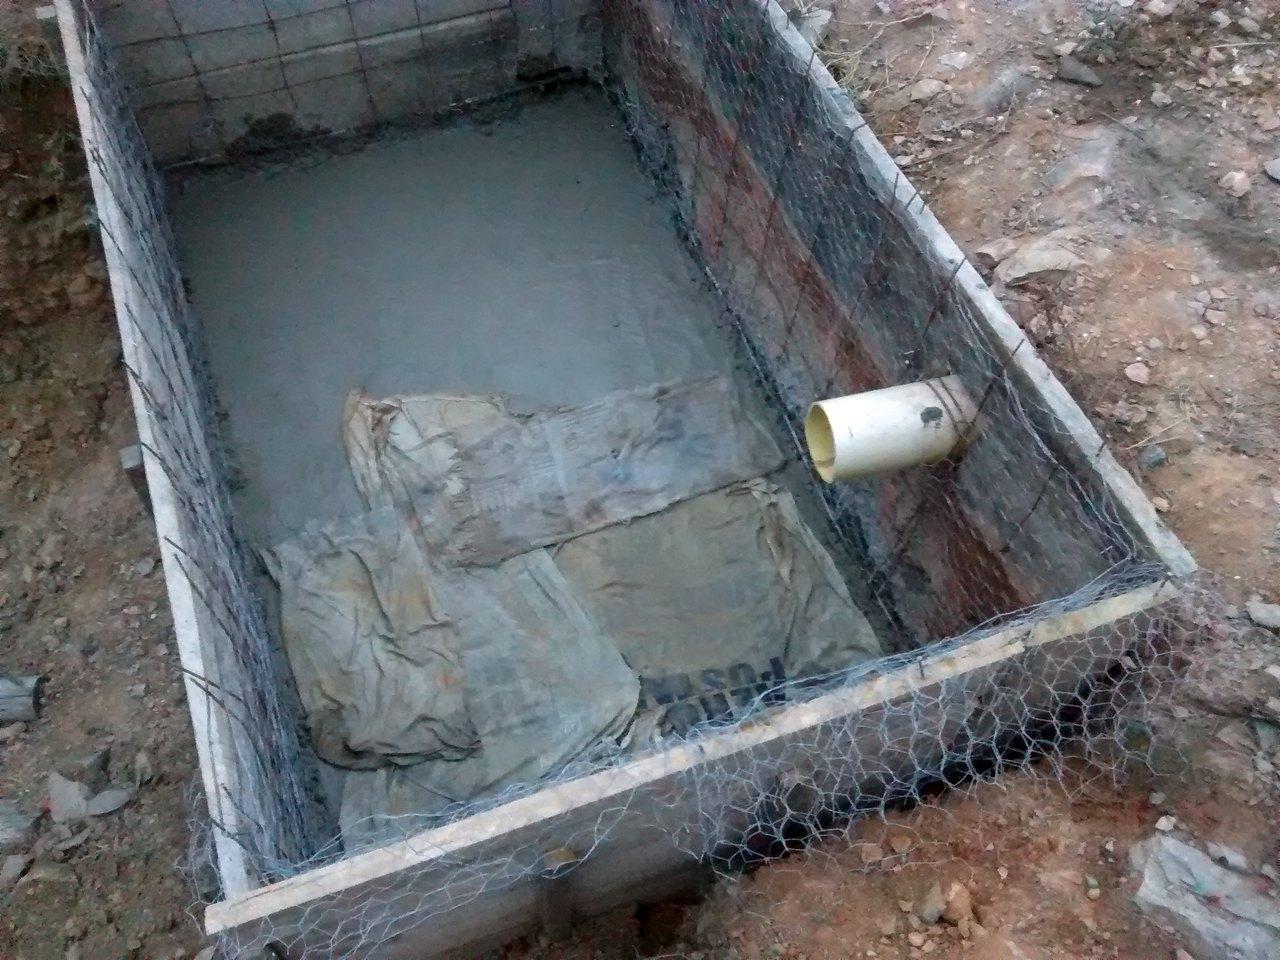 trapos curado concreto piso filtro aerobio